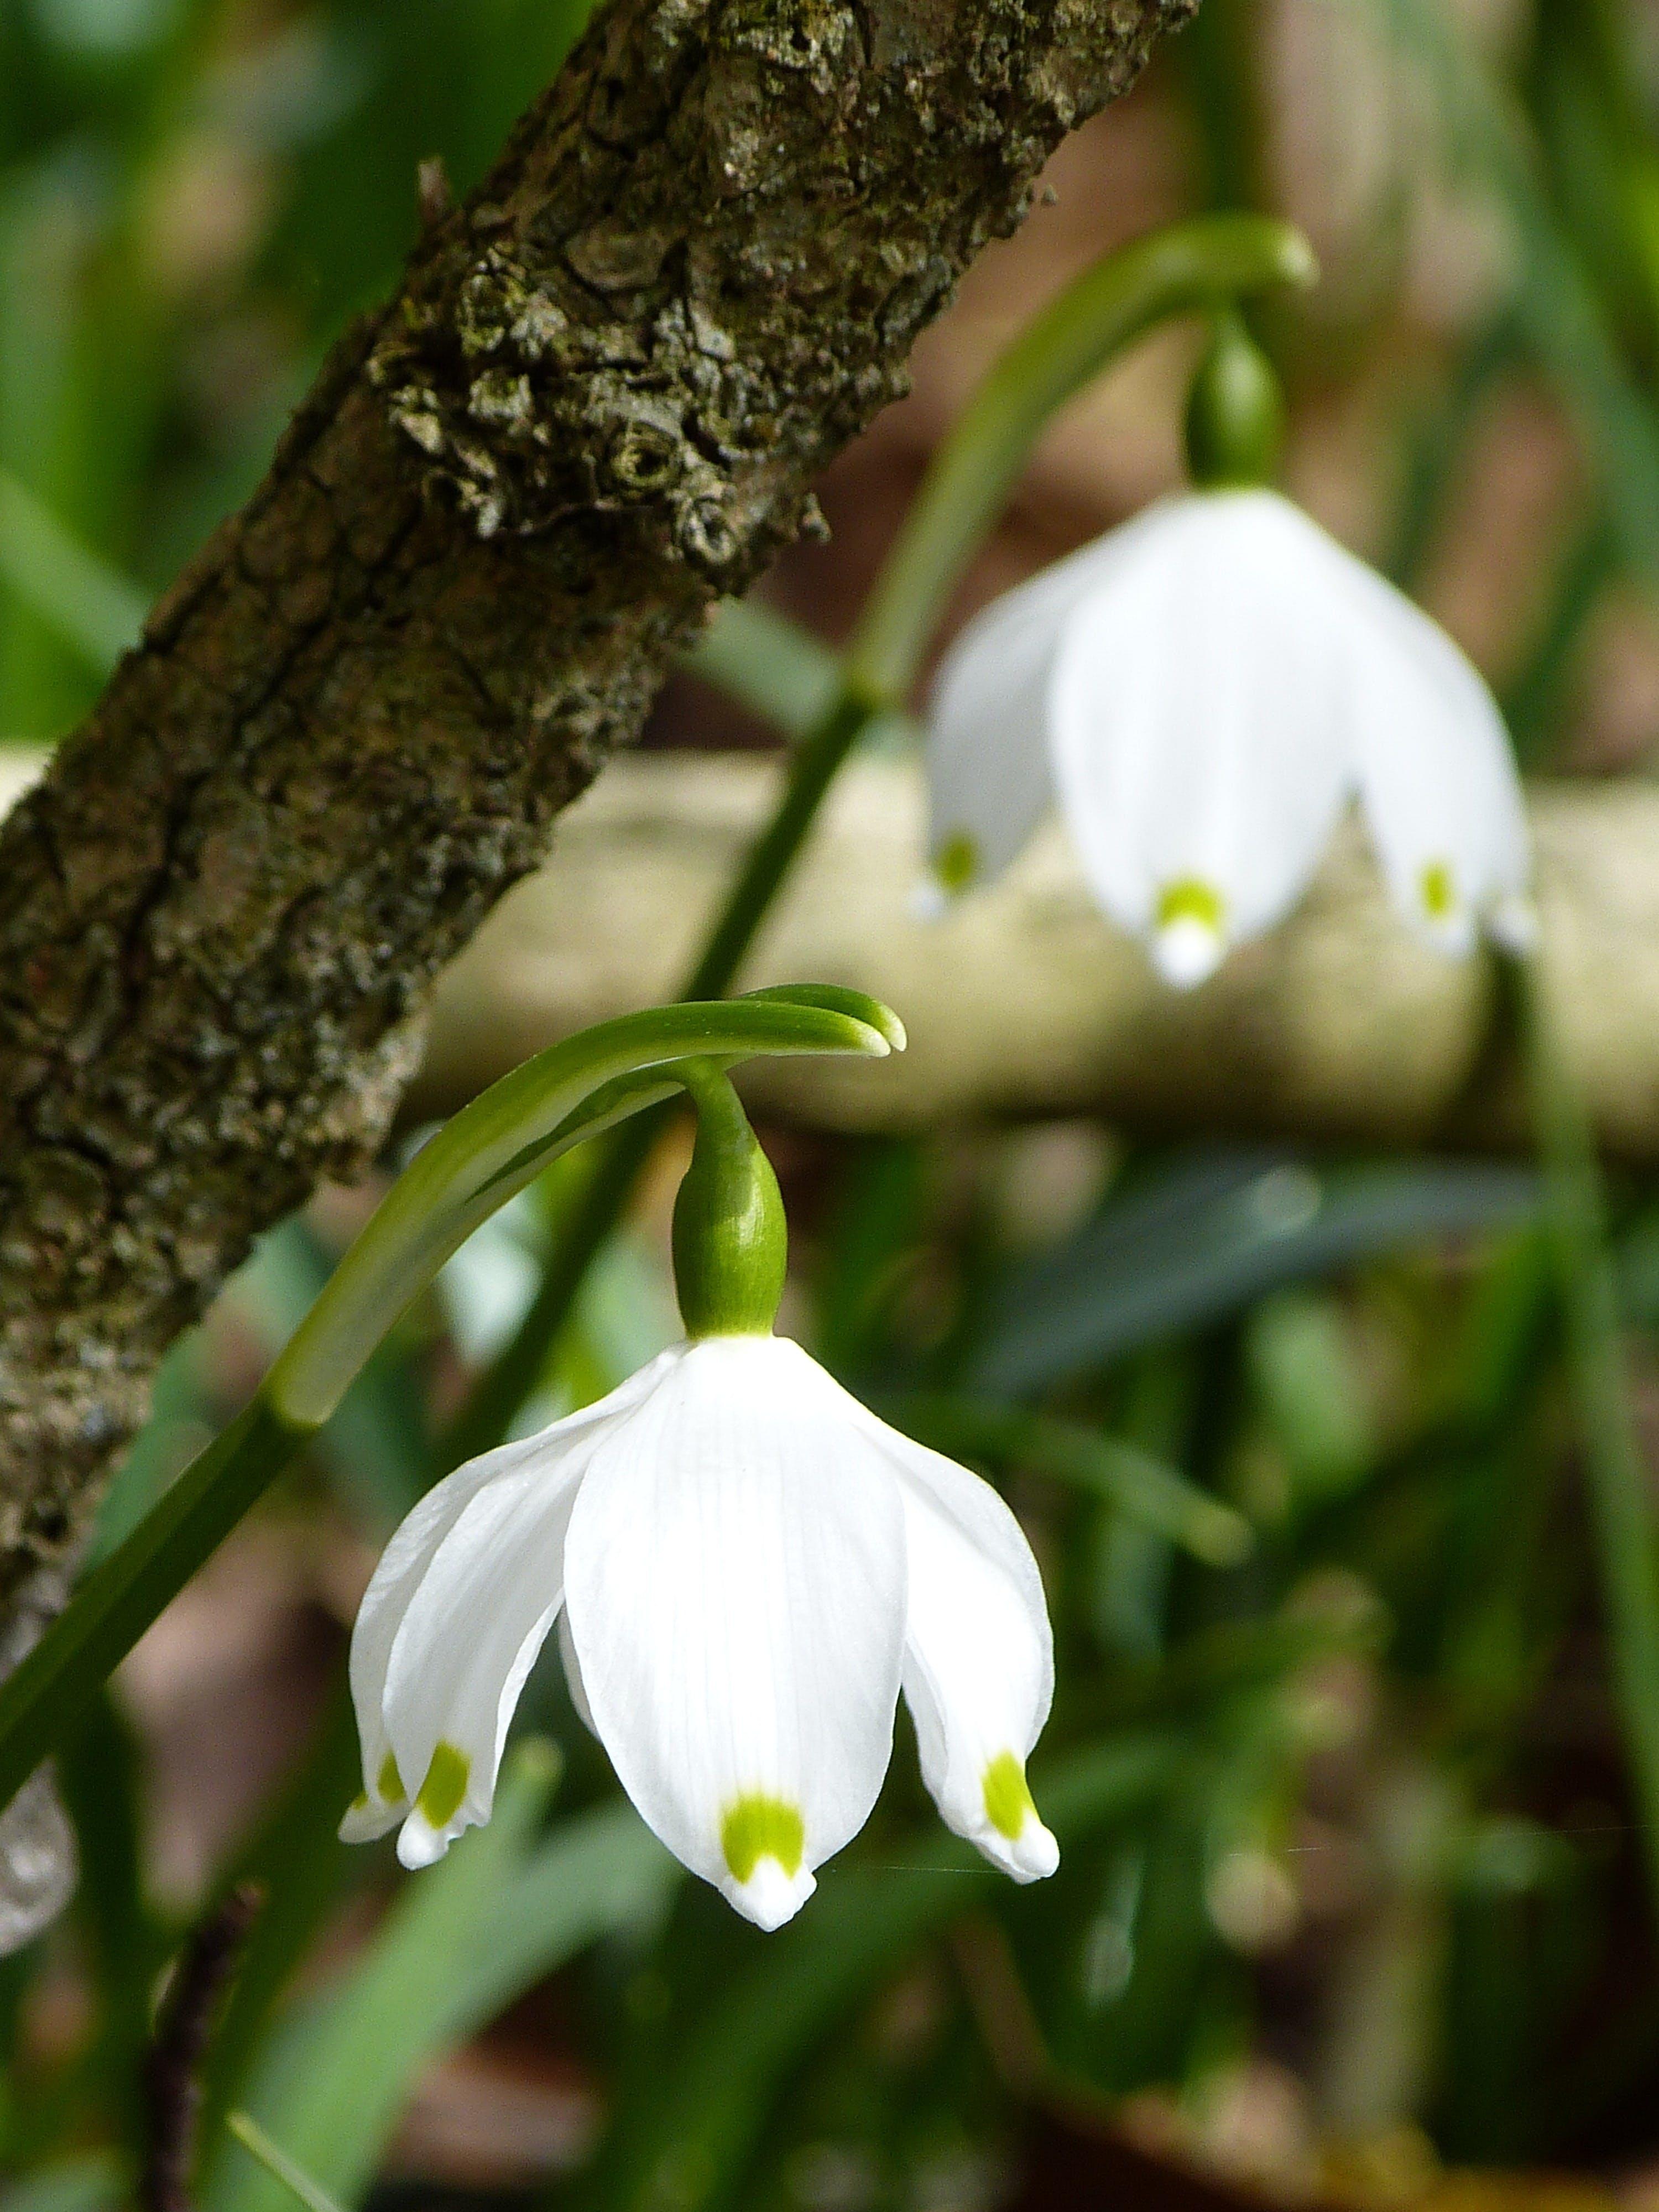 White Down Facing Flower